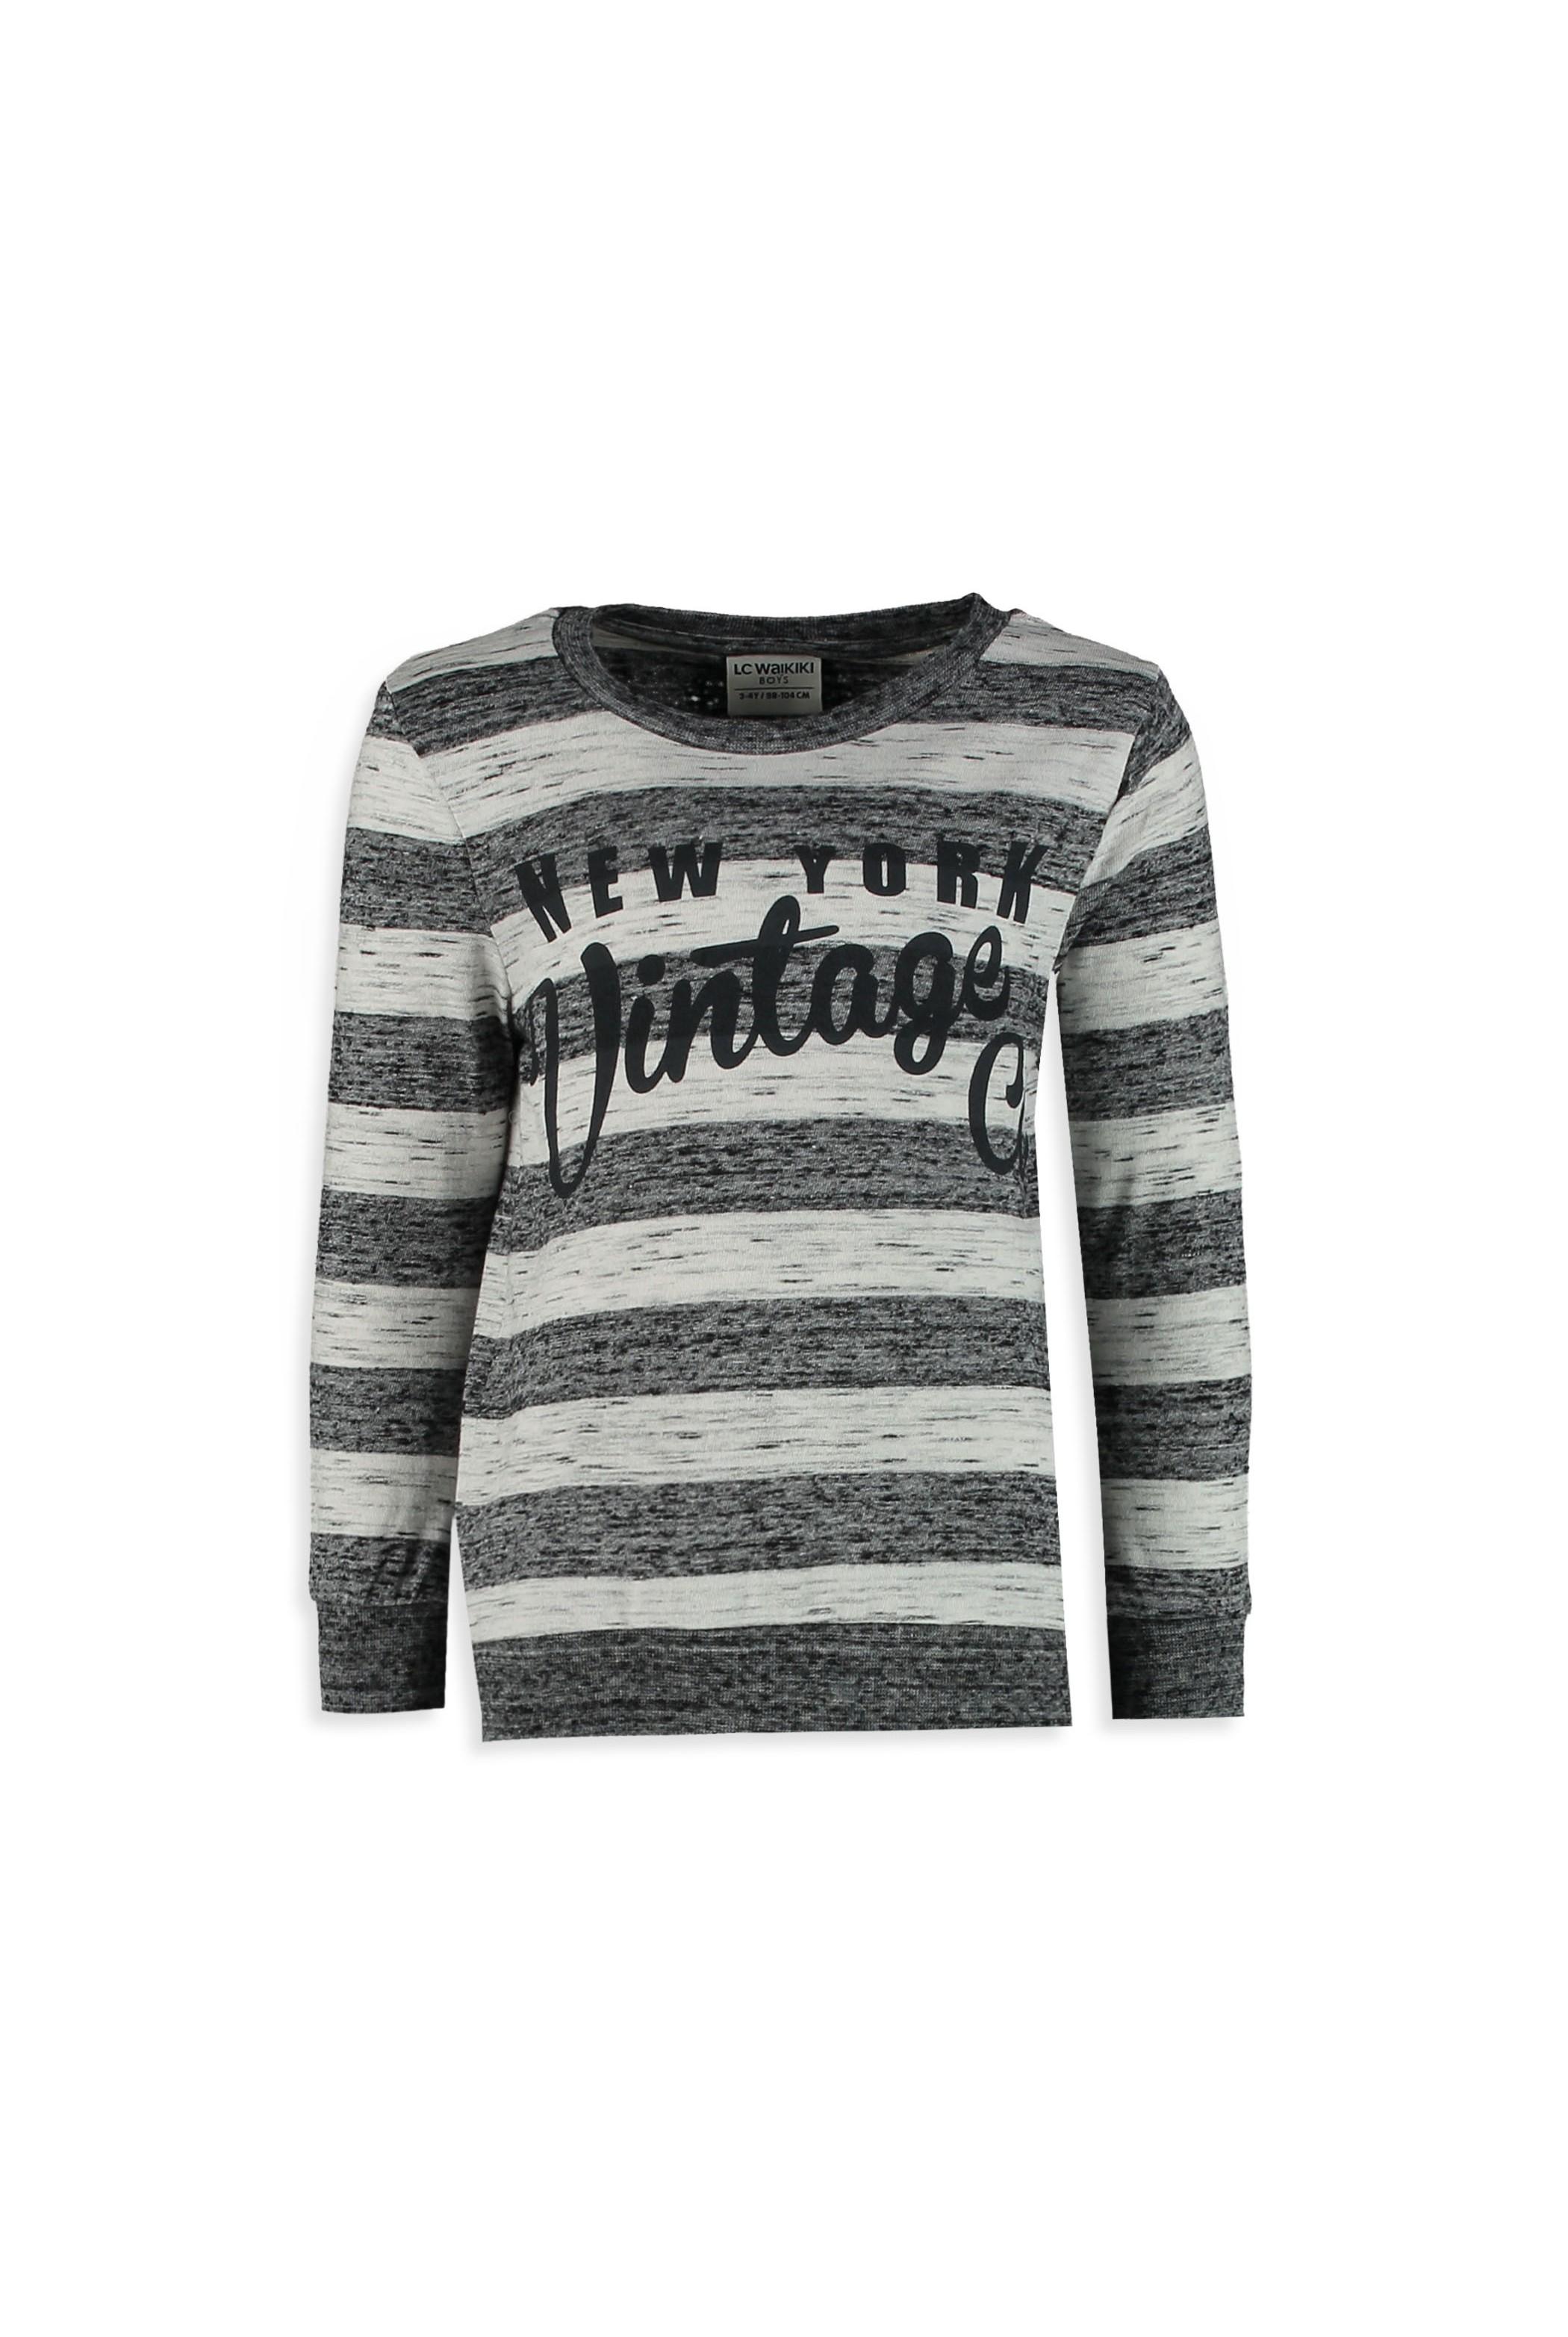 47153ce4e ملابس الاطفال | السي وايكيكي Lcwaikiki | تسوق اون لاين في تركيا | سوق ادويت